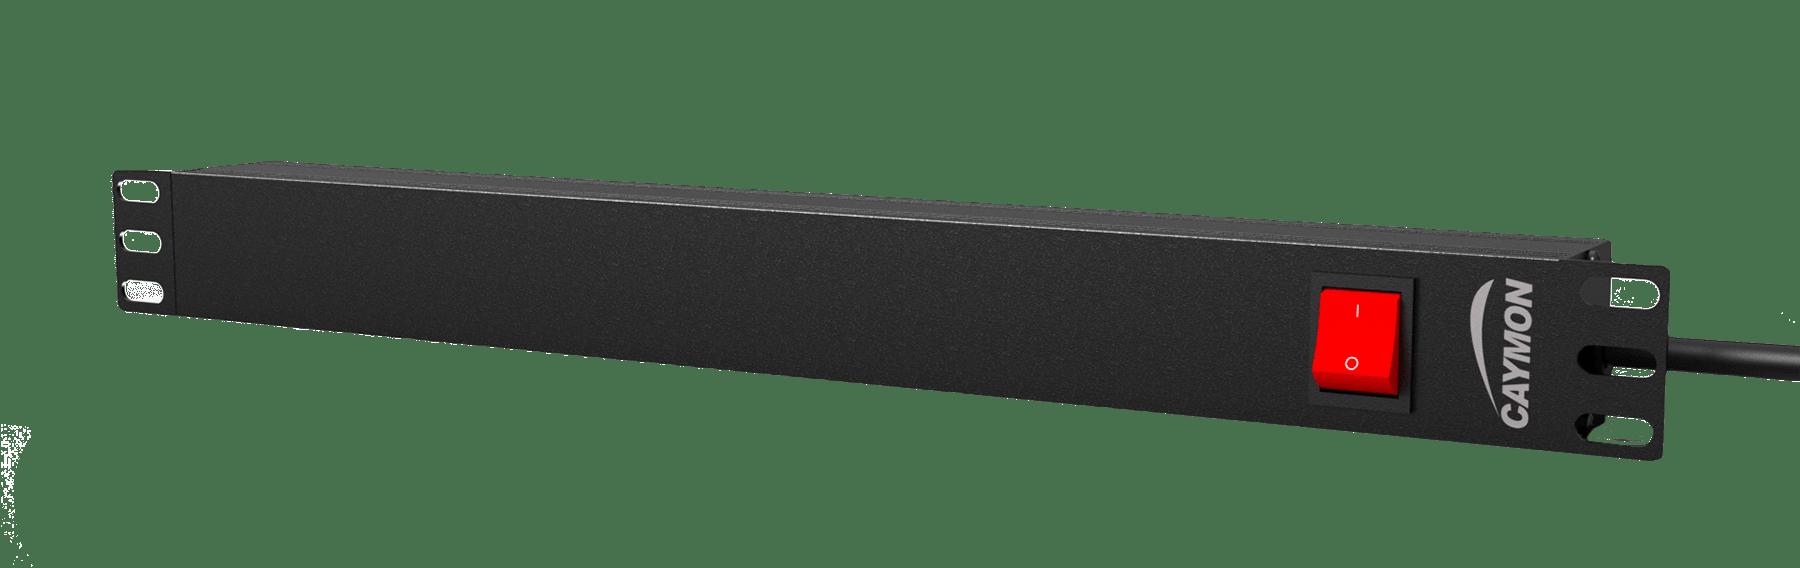 "PSR118ES - 19"" power distribution unit - 8x IEC C13 socket + rear switch"